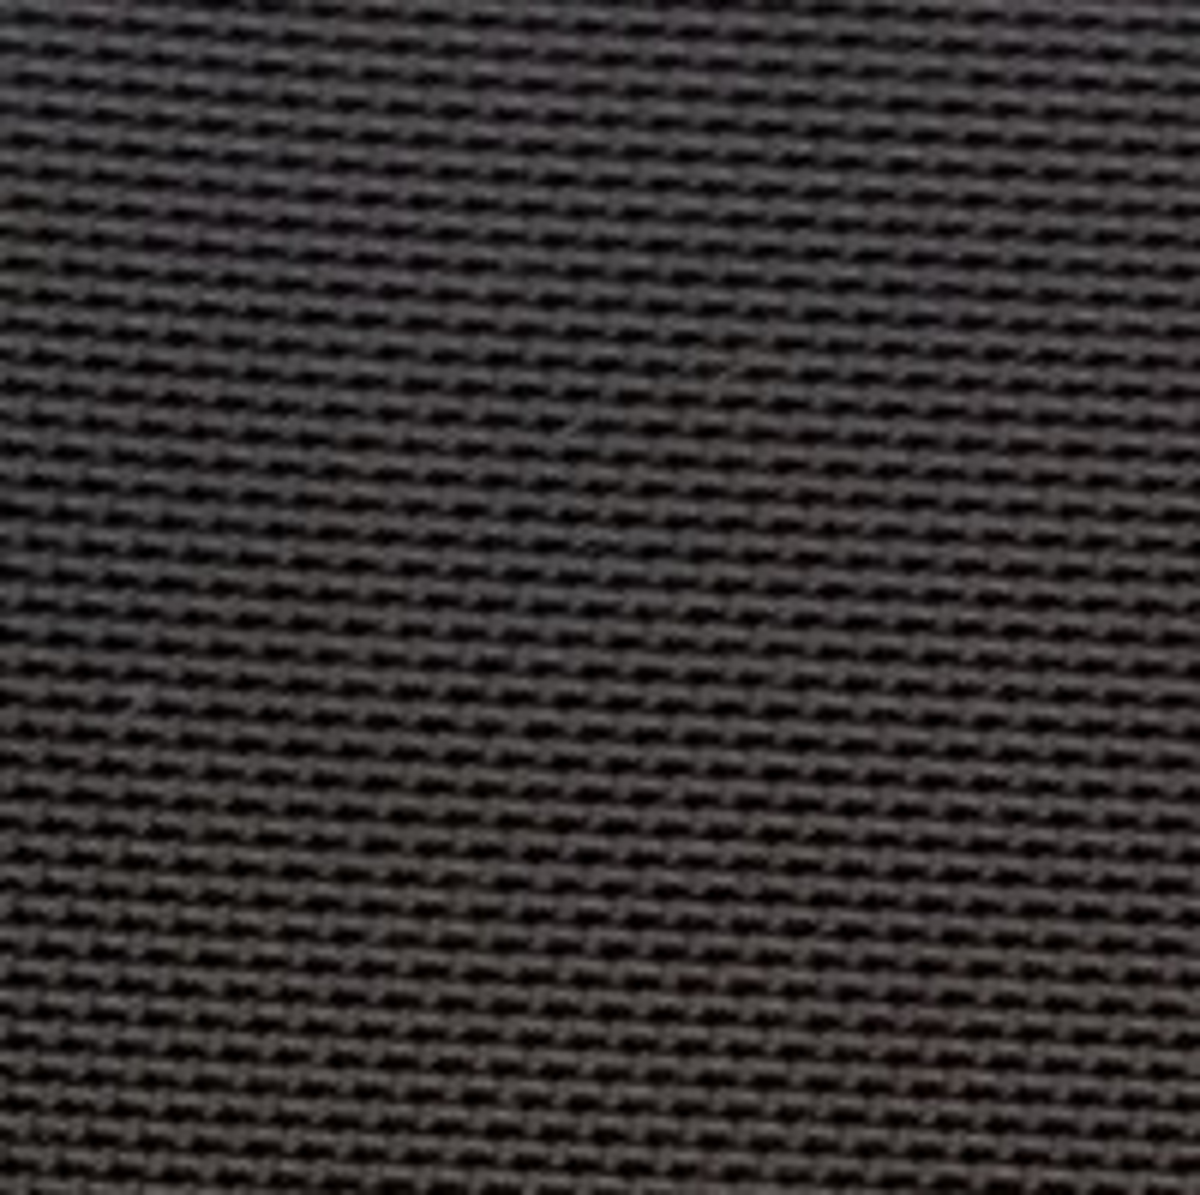 1050 Denier coated Ballistic Nylon